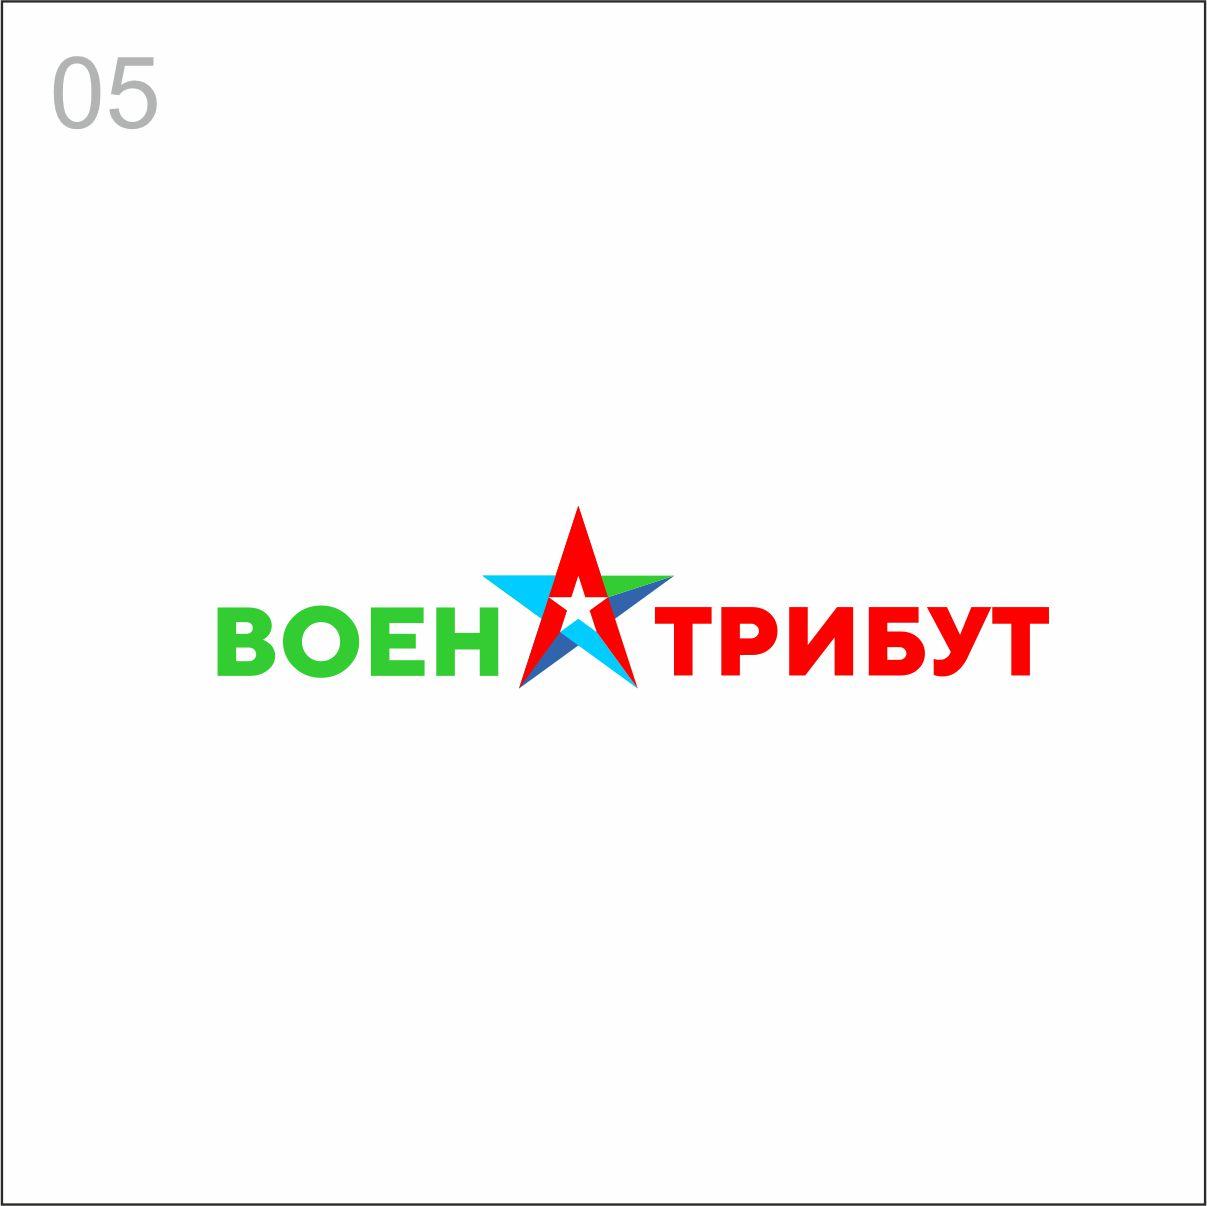 Разработка логотипа для компании военной тематики фото f_7546020c199e063b.jpg